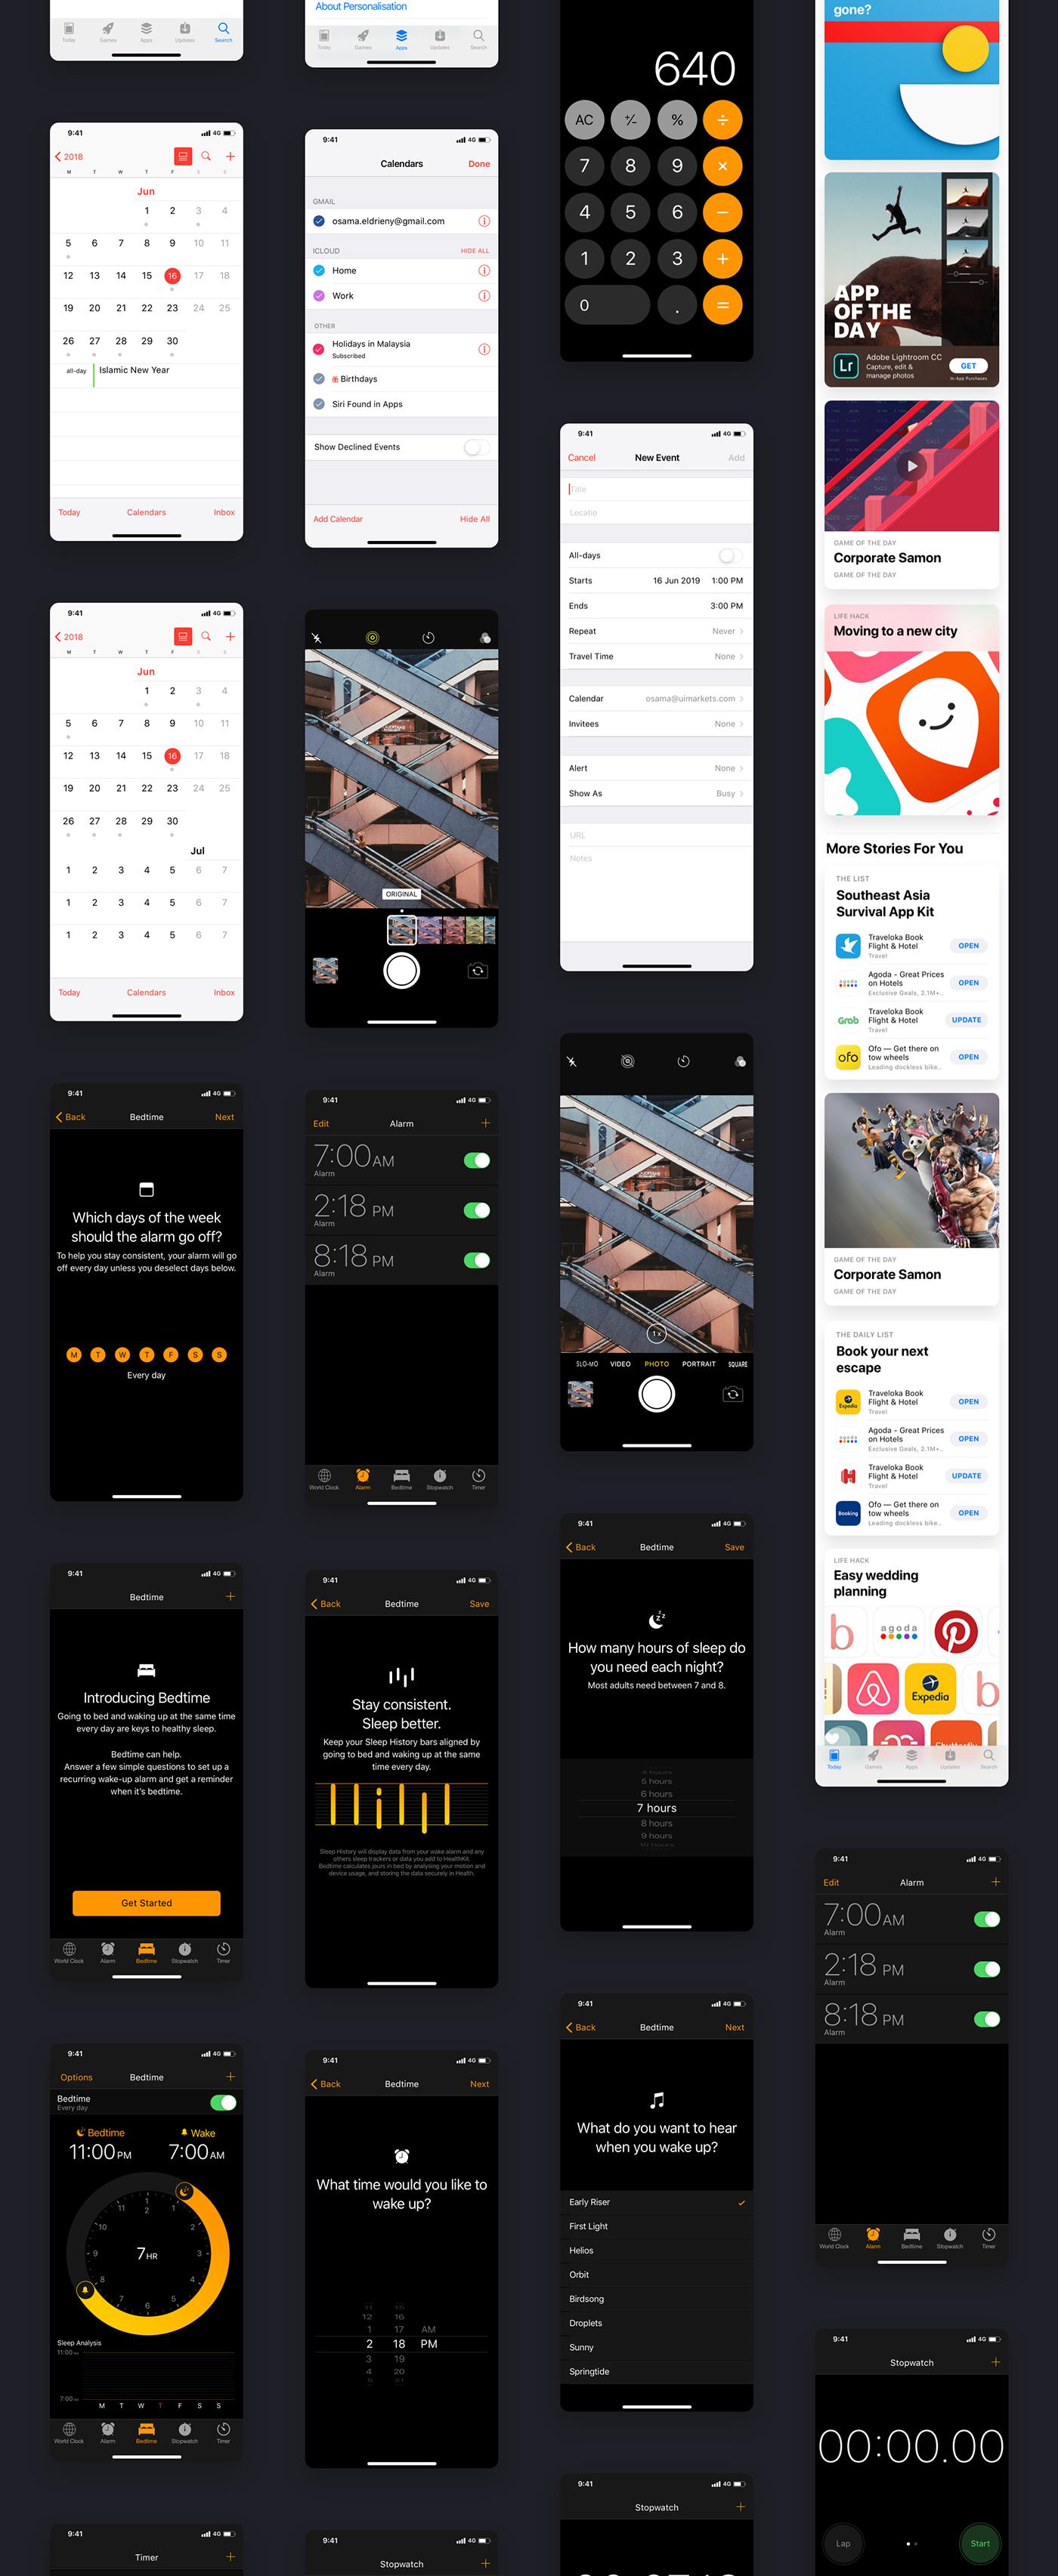 iOS12 ios ui kit UI kit iphone kit Mockup wireframe prototype iphone xs